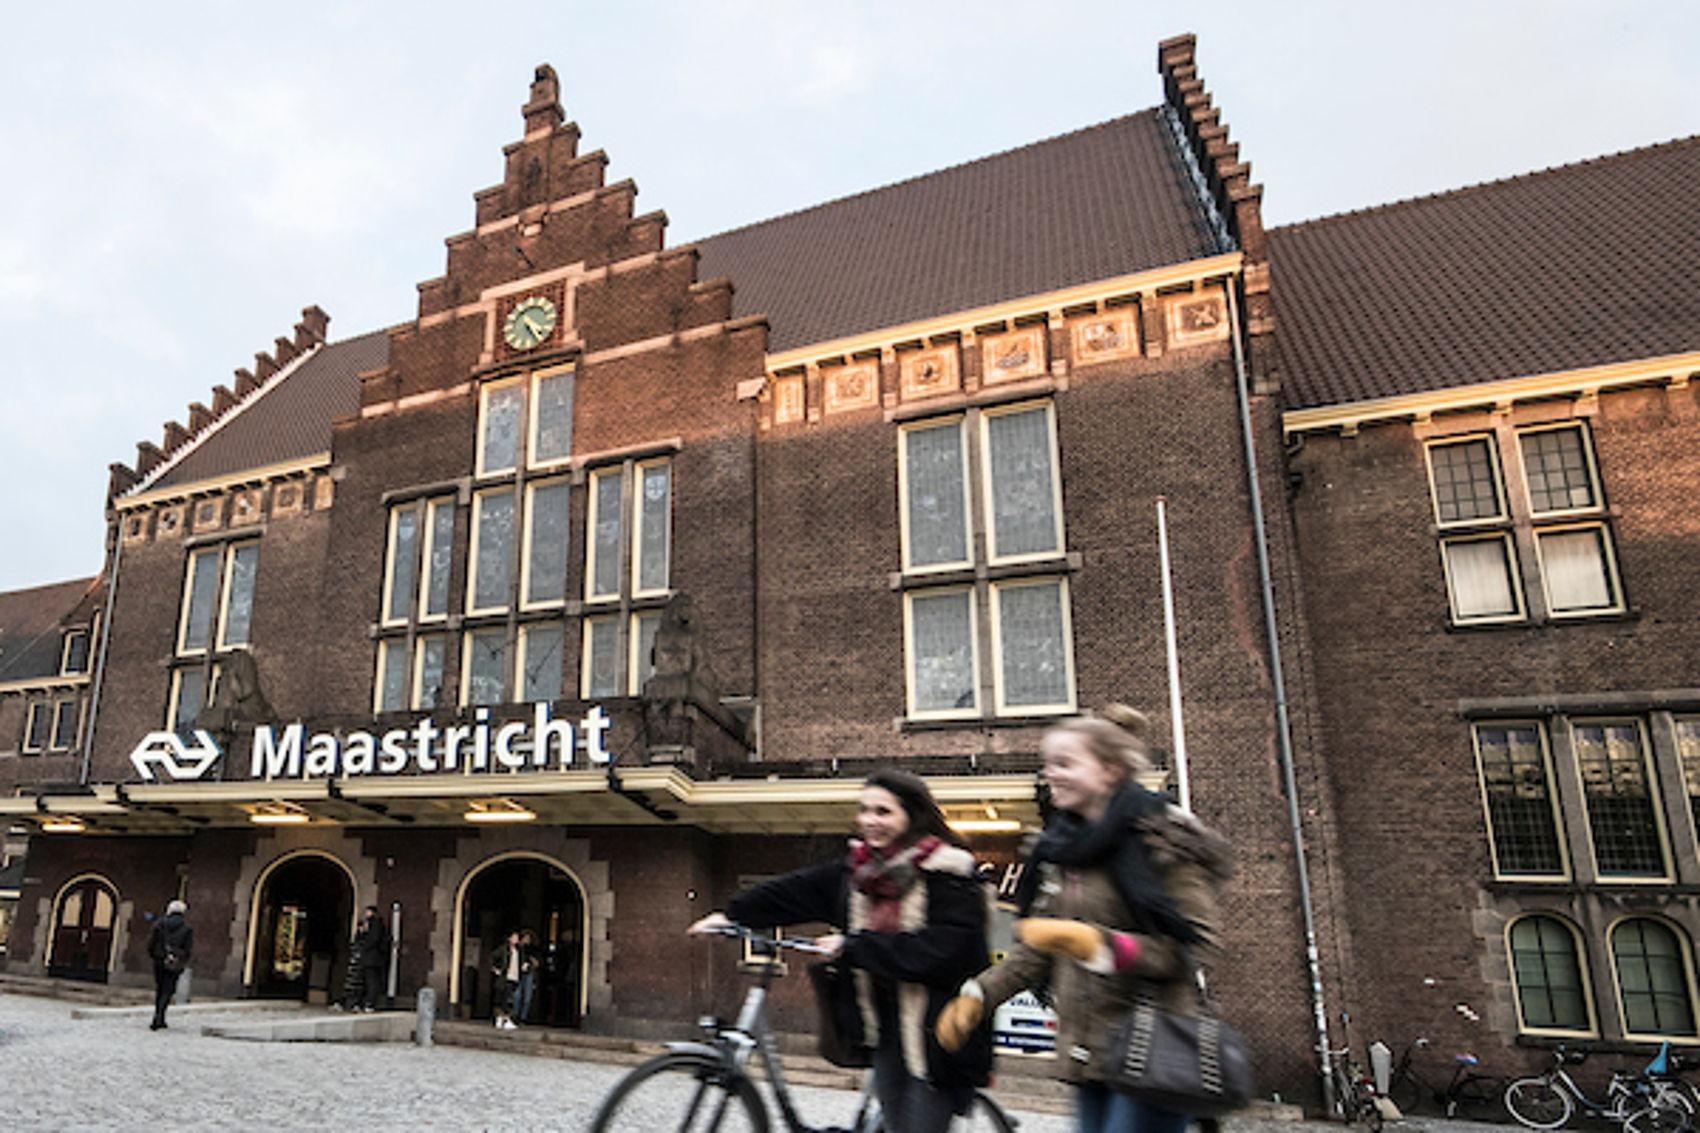 Maastricht is focusing on international rail travel